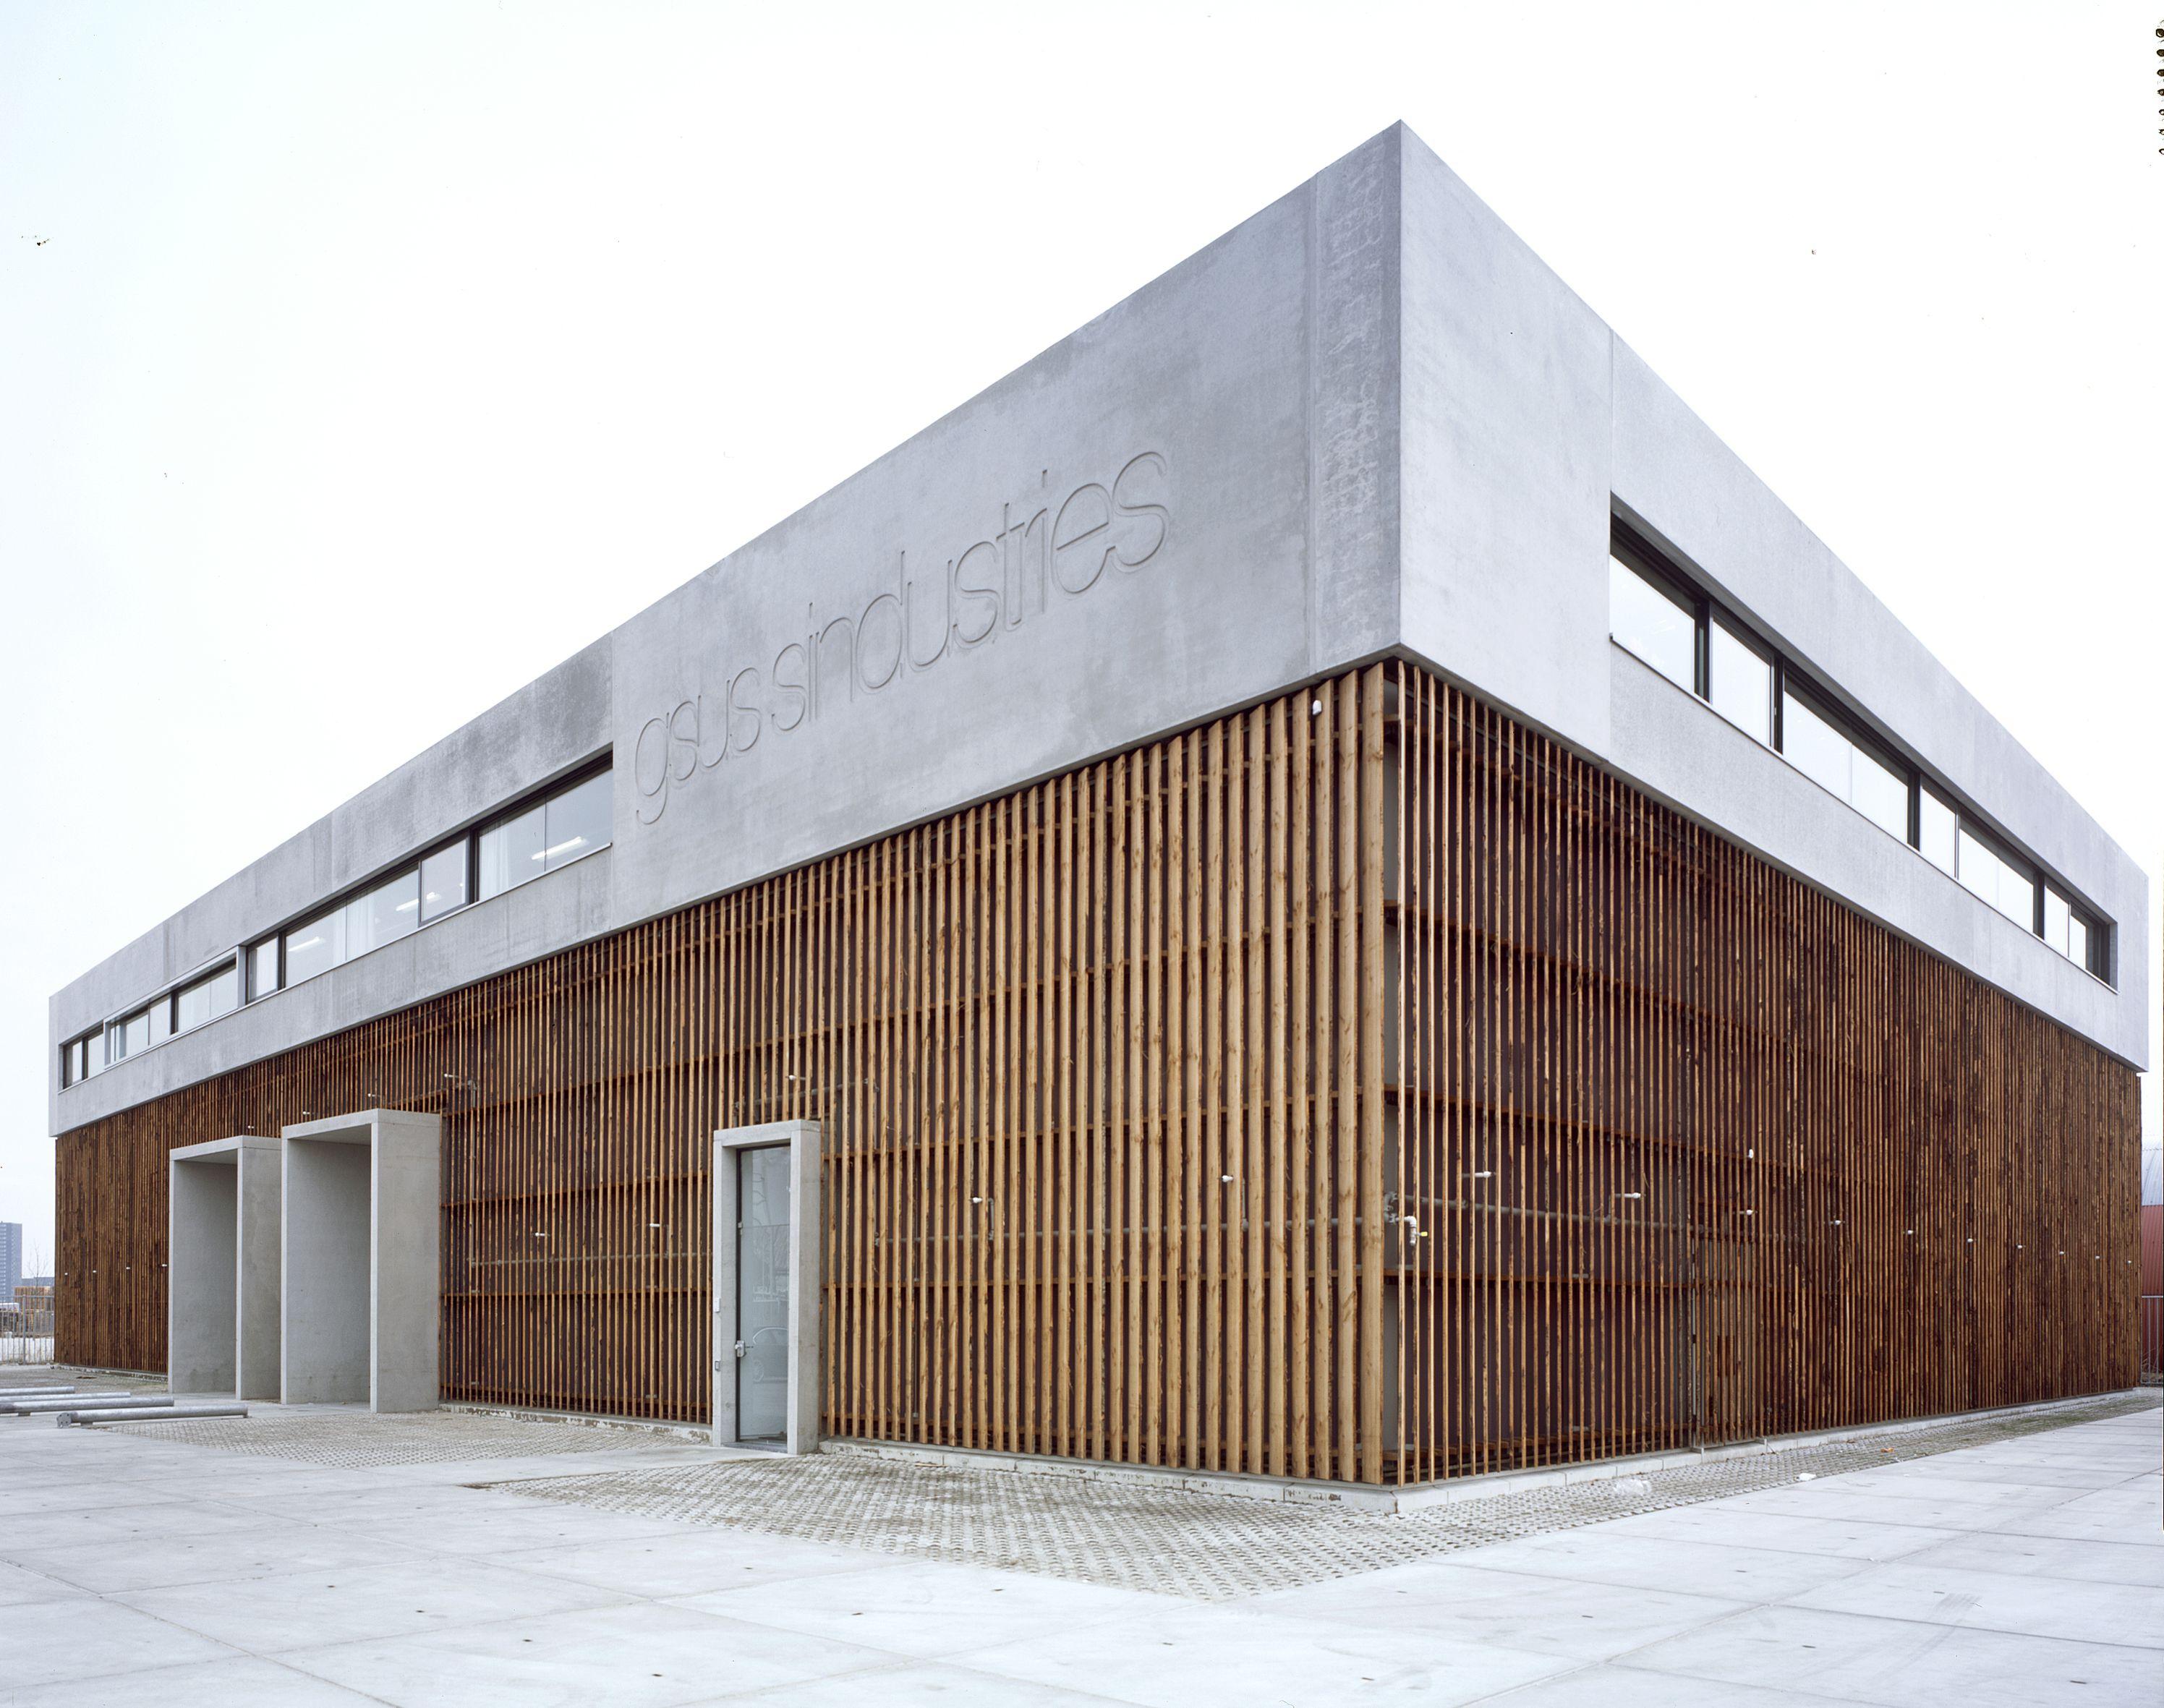 Gsus Sindustries Headquarters Evelo Architecten Studio Anja Evelo